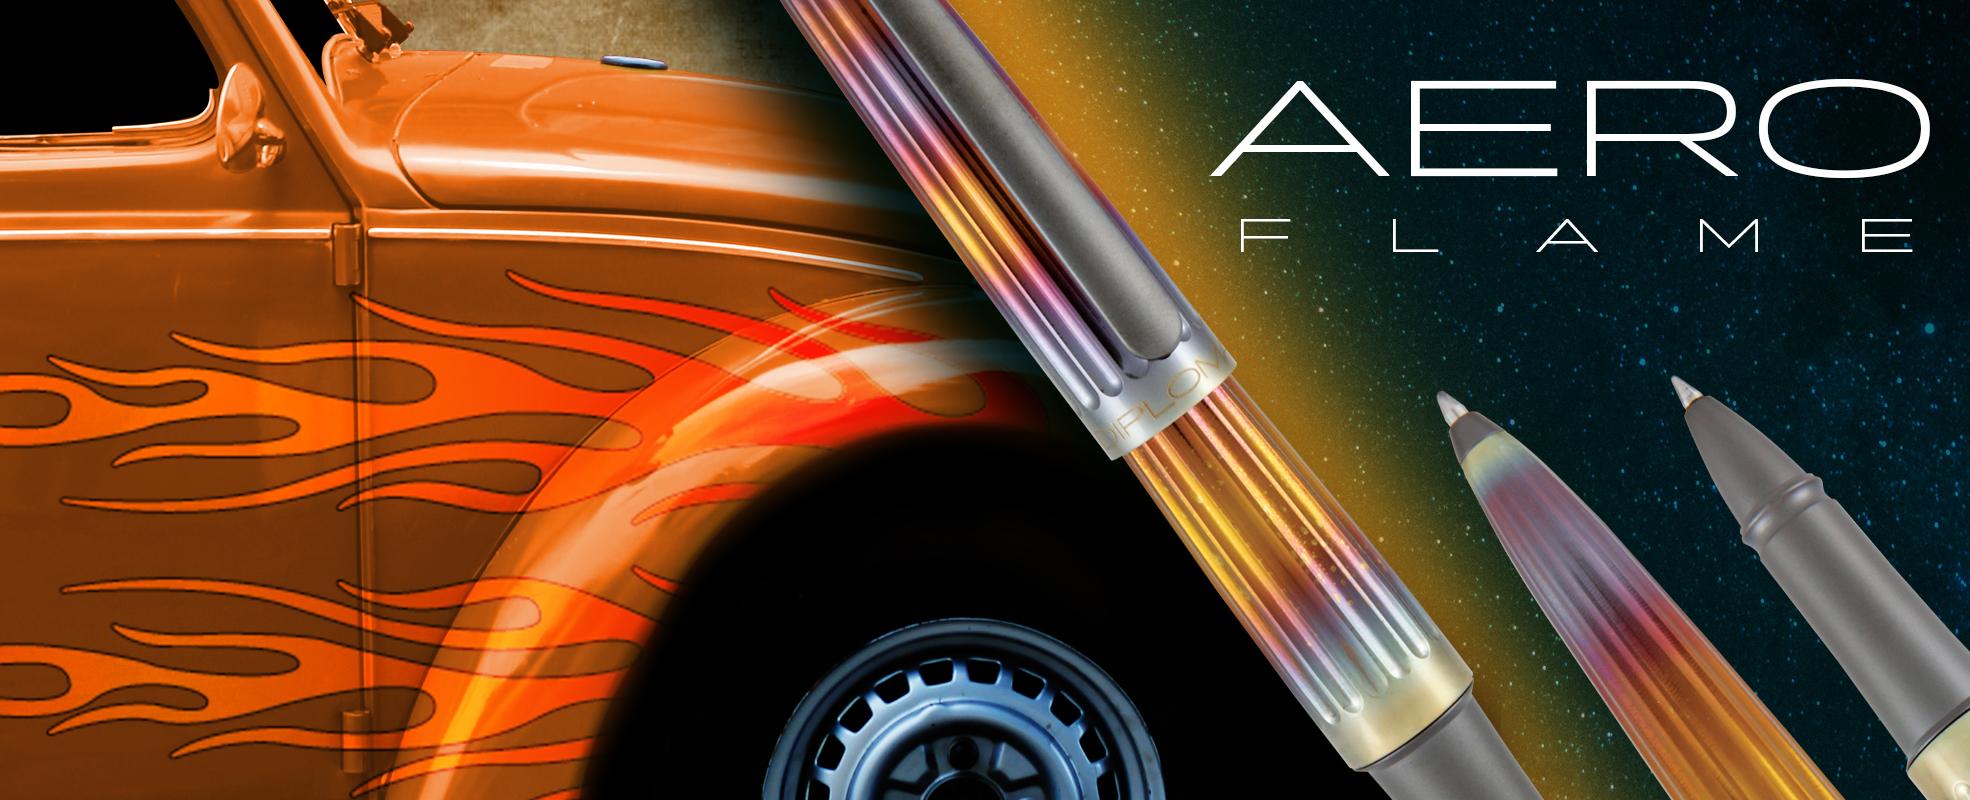 aero-flame-banner-new-1.jpg